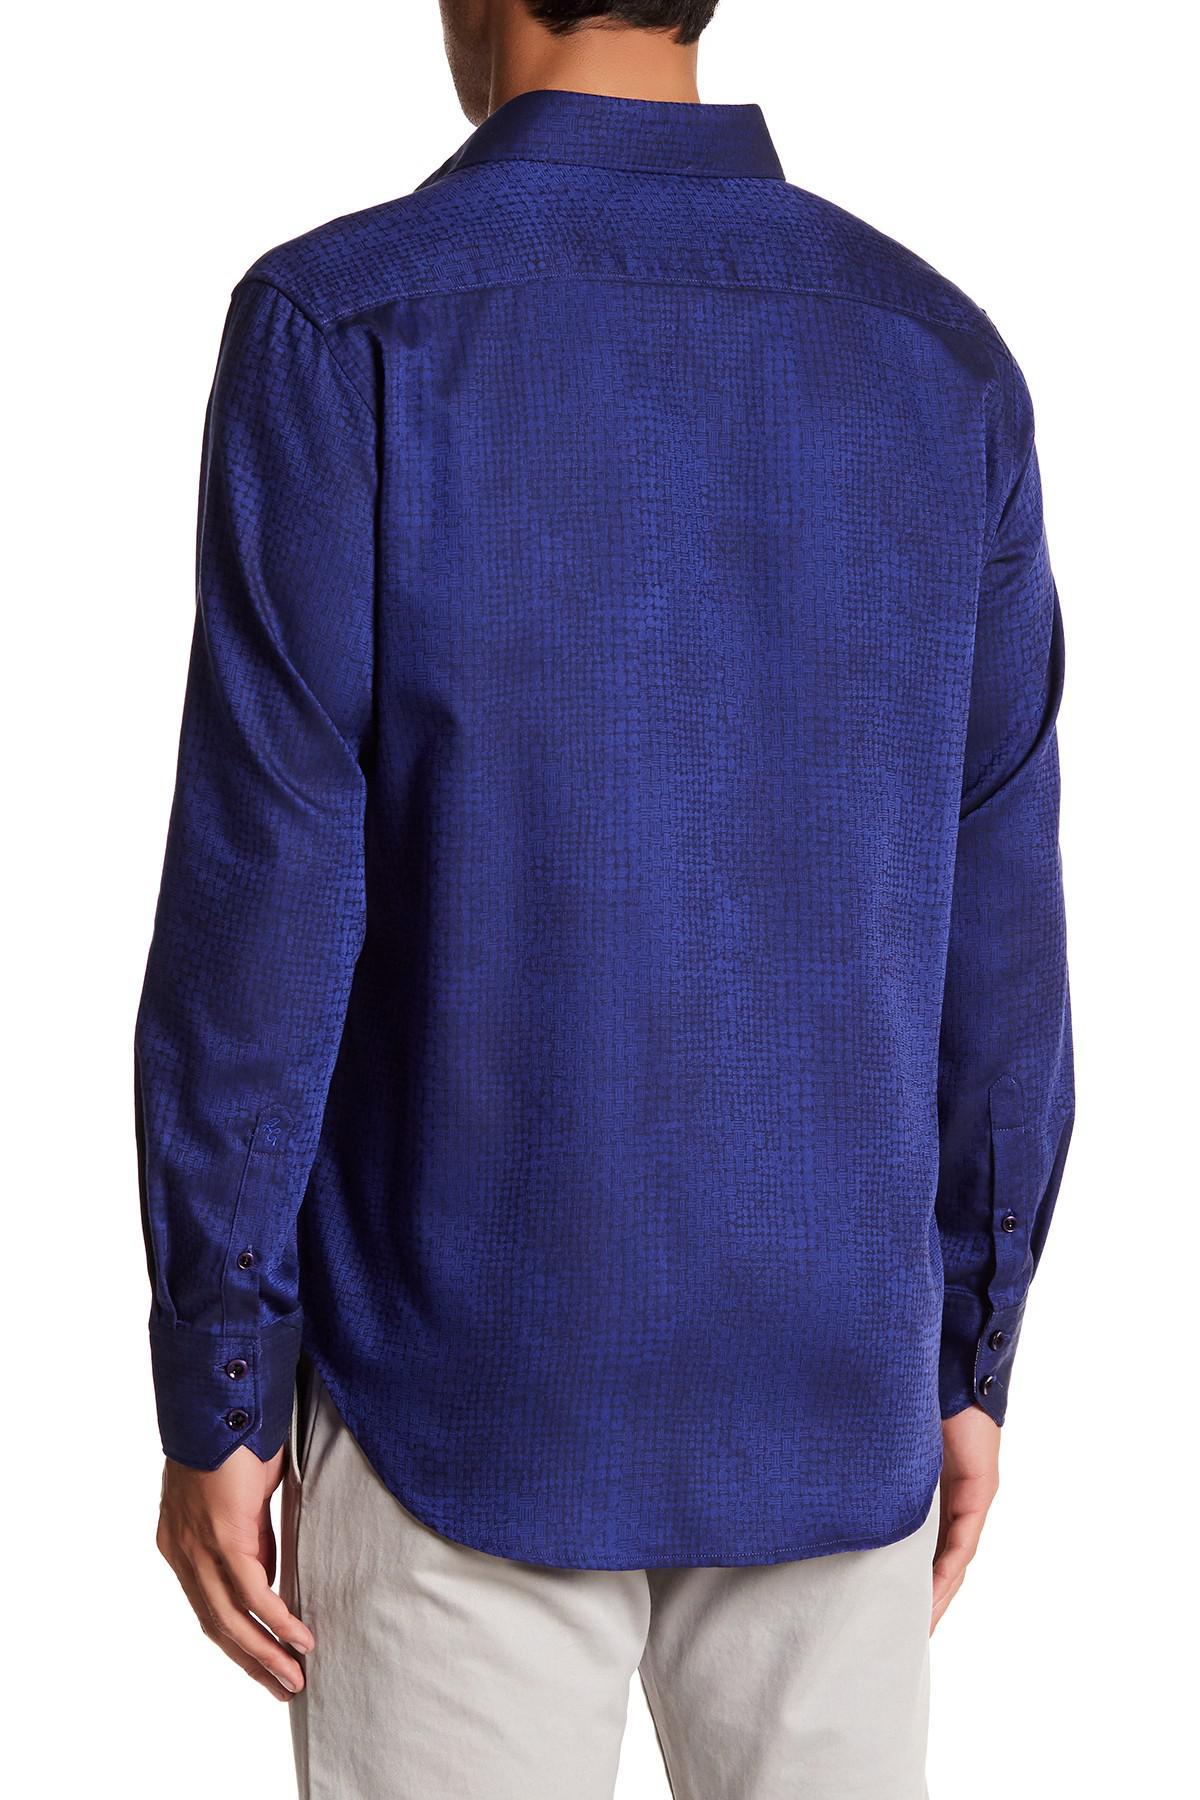 niagara falls men Shop niagara falls ontario men's clothing from cafepress find great designs on t-shirts, hoodies, pajamas, sweatshirts, boxer shorts and more free returns 100% satisfaction guarantee fast shipping.